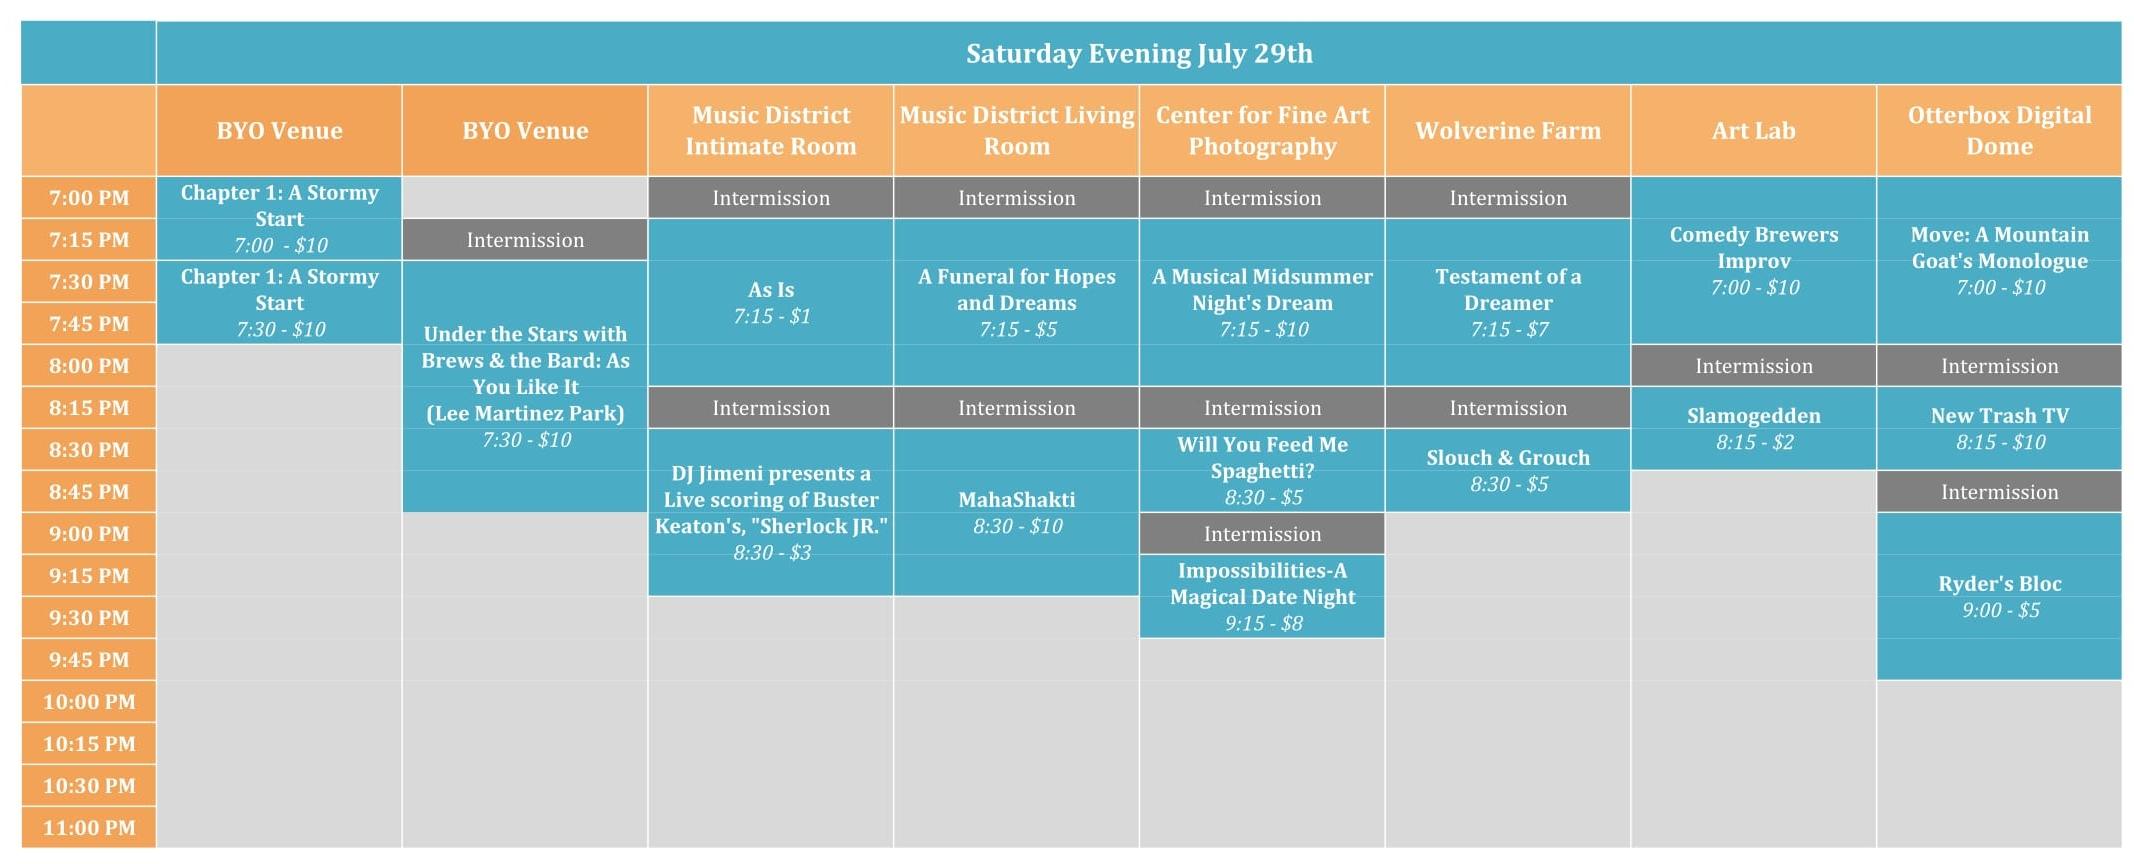 MASTER - FCFF 2017 Master Event Schedule 4 Saturday Evening-1.jpg